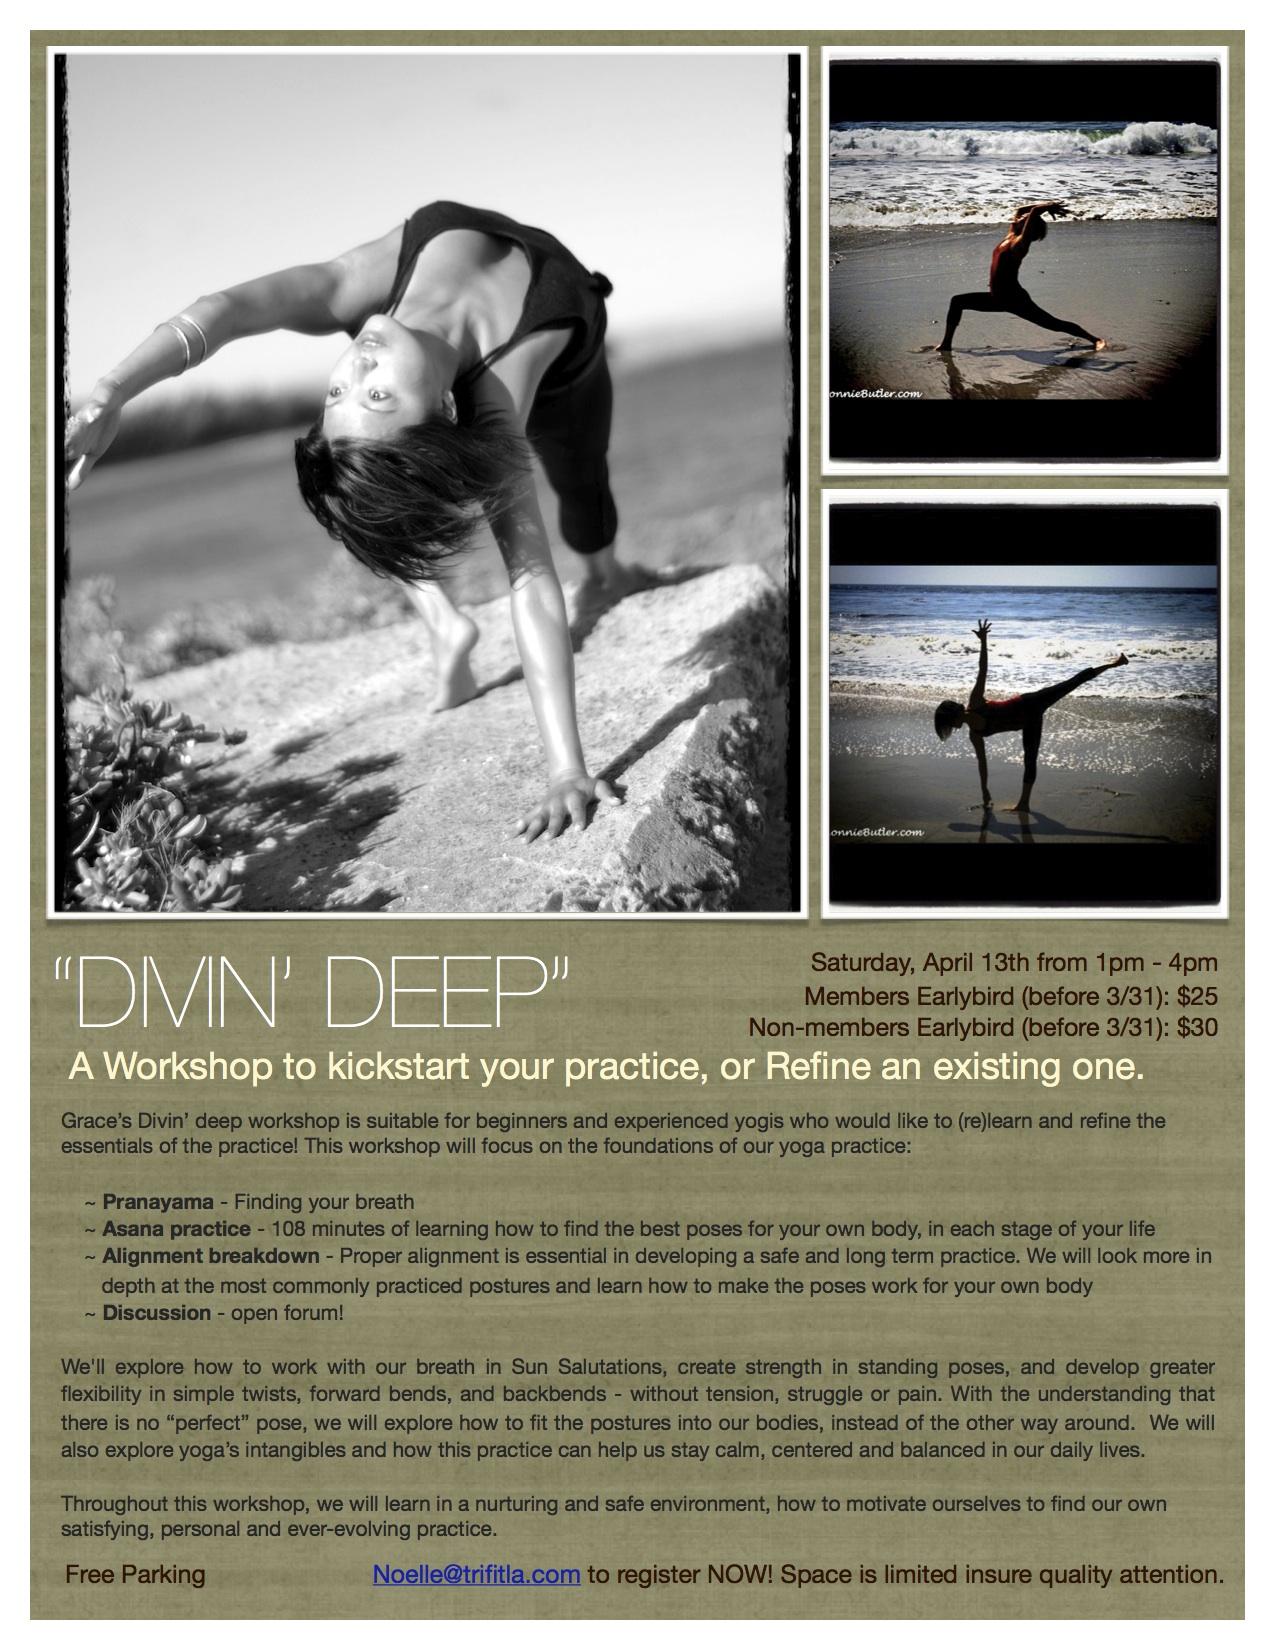 Divin' Deep Workshop with Grace